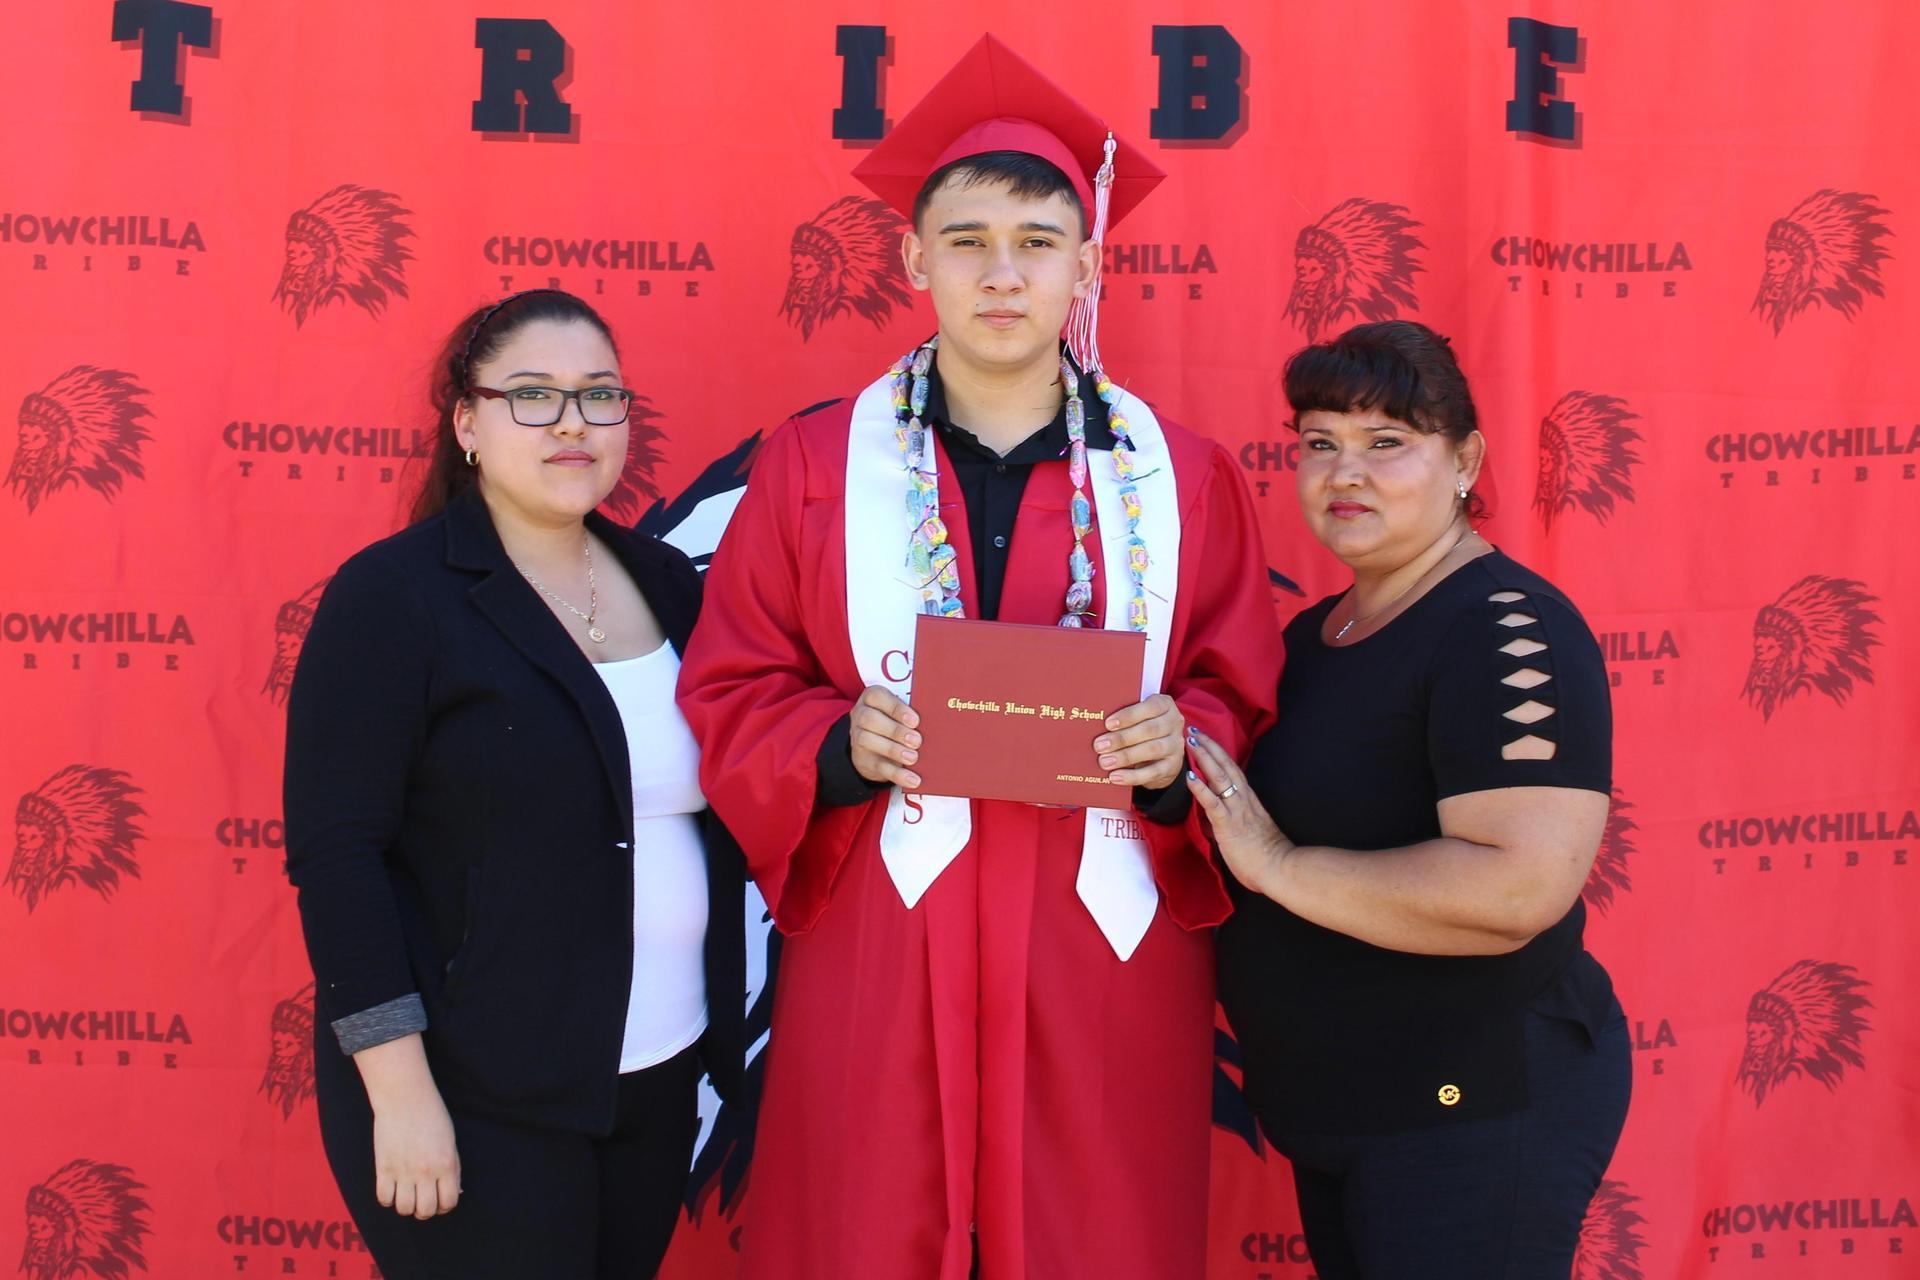 Antonio Aguilar and family